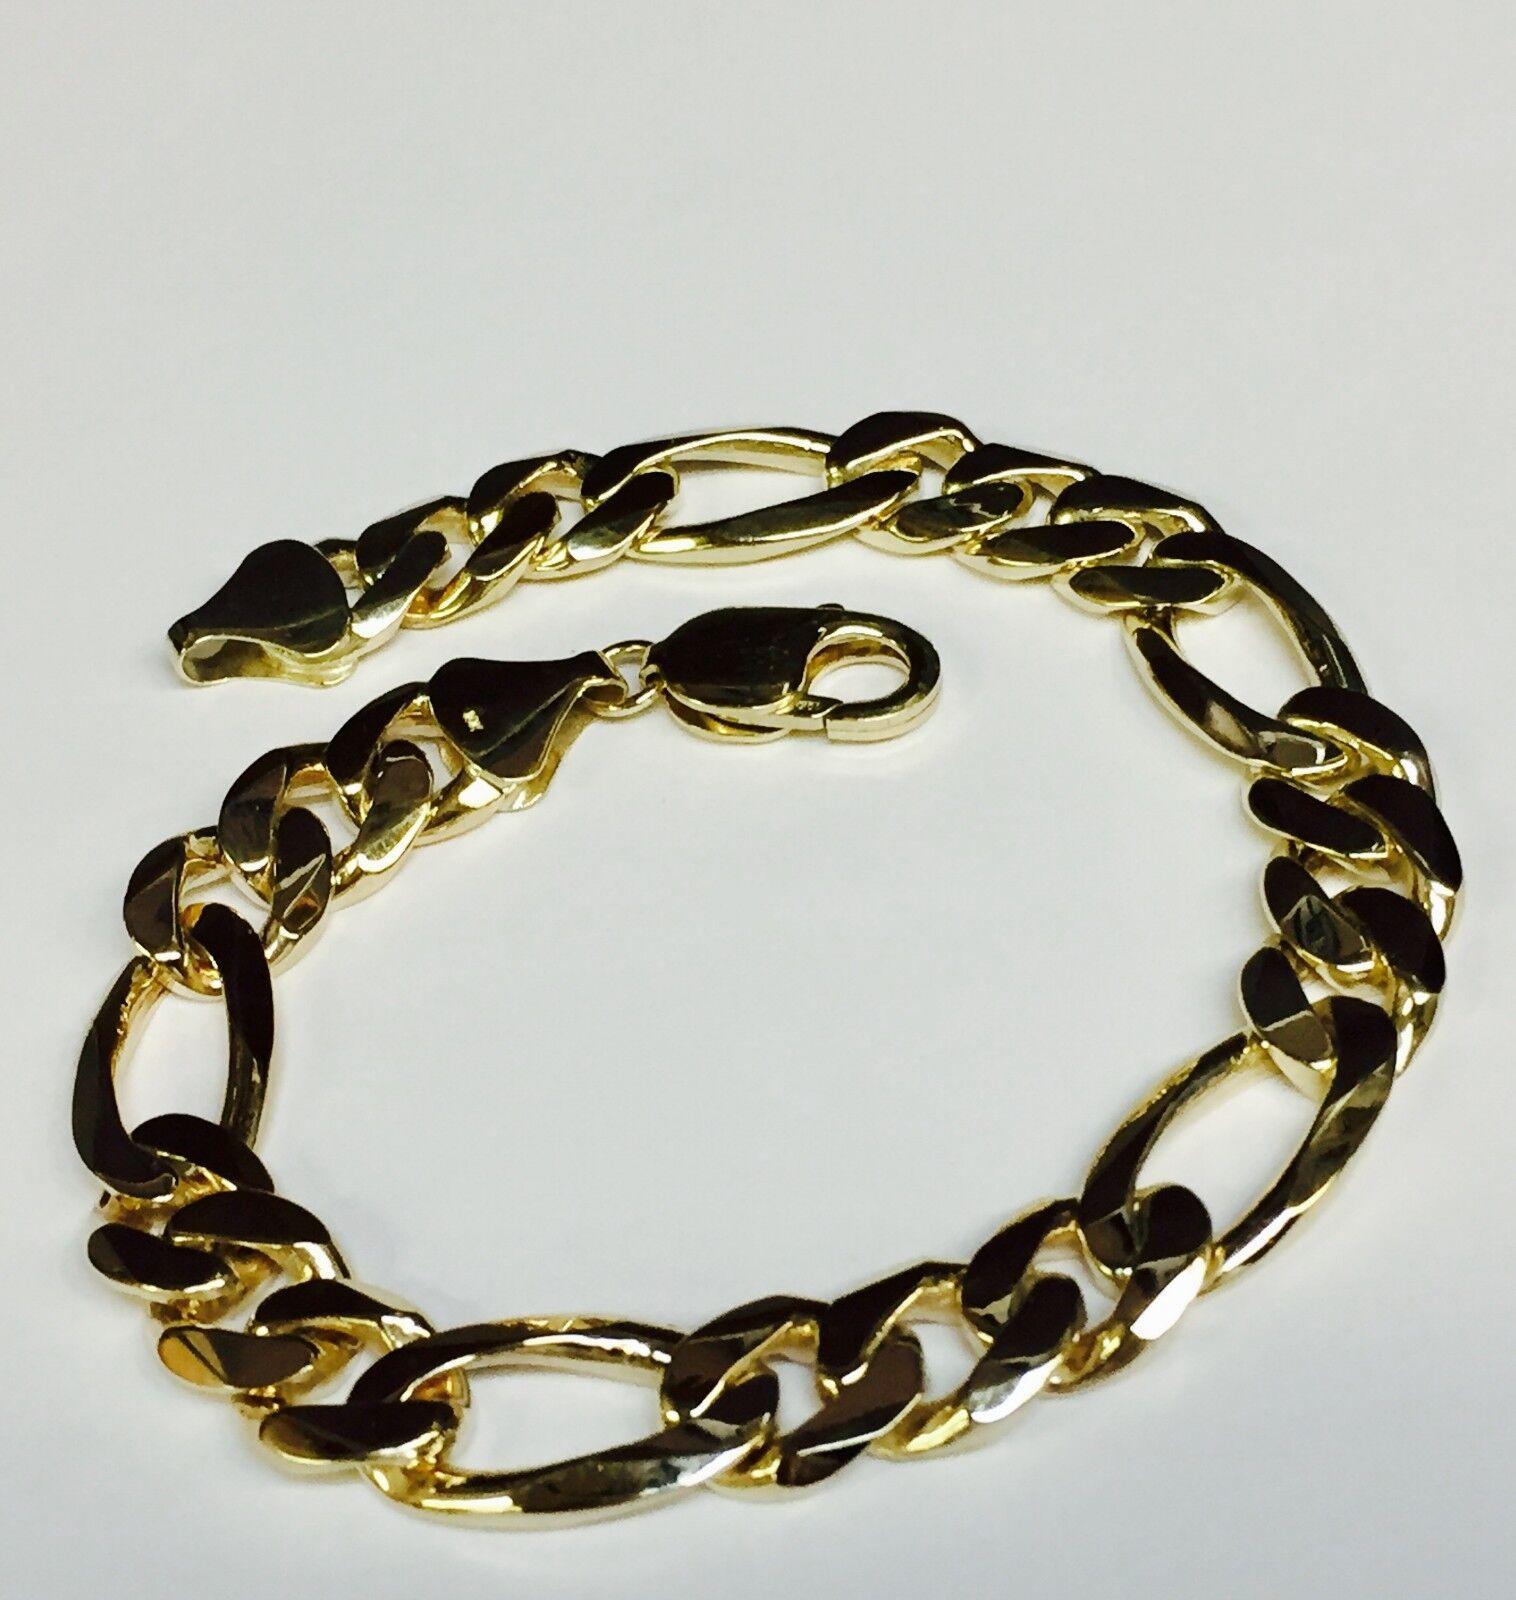 10k Solid Yellow gold Handmade Figaro Curb Link Mens Bracelet 9.5  46 grams 12MM